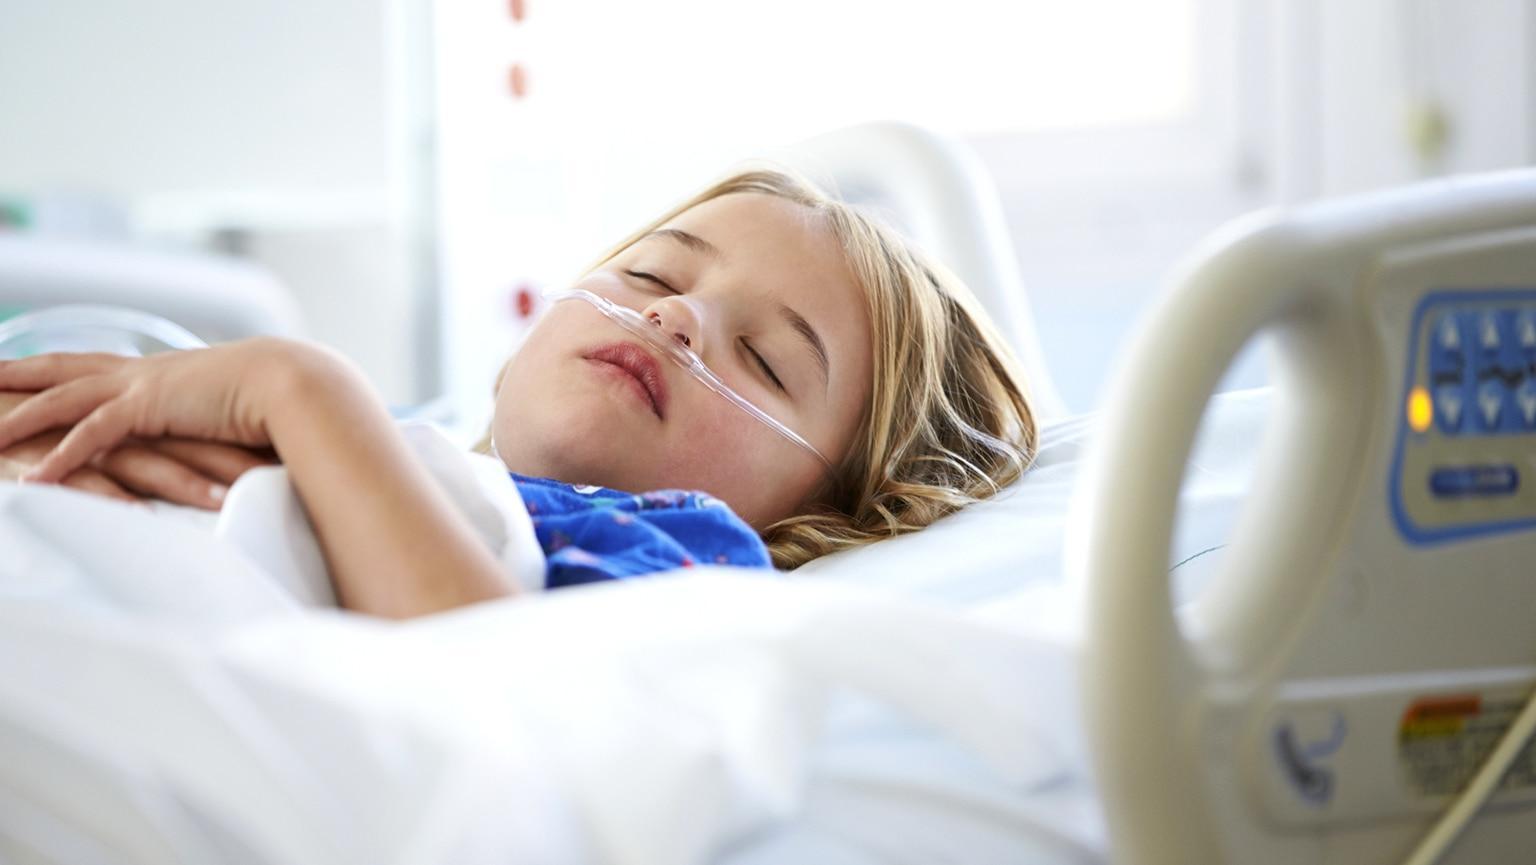 Бестселлер среди лекарств: аспирин может помочь даже от рака